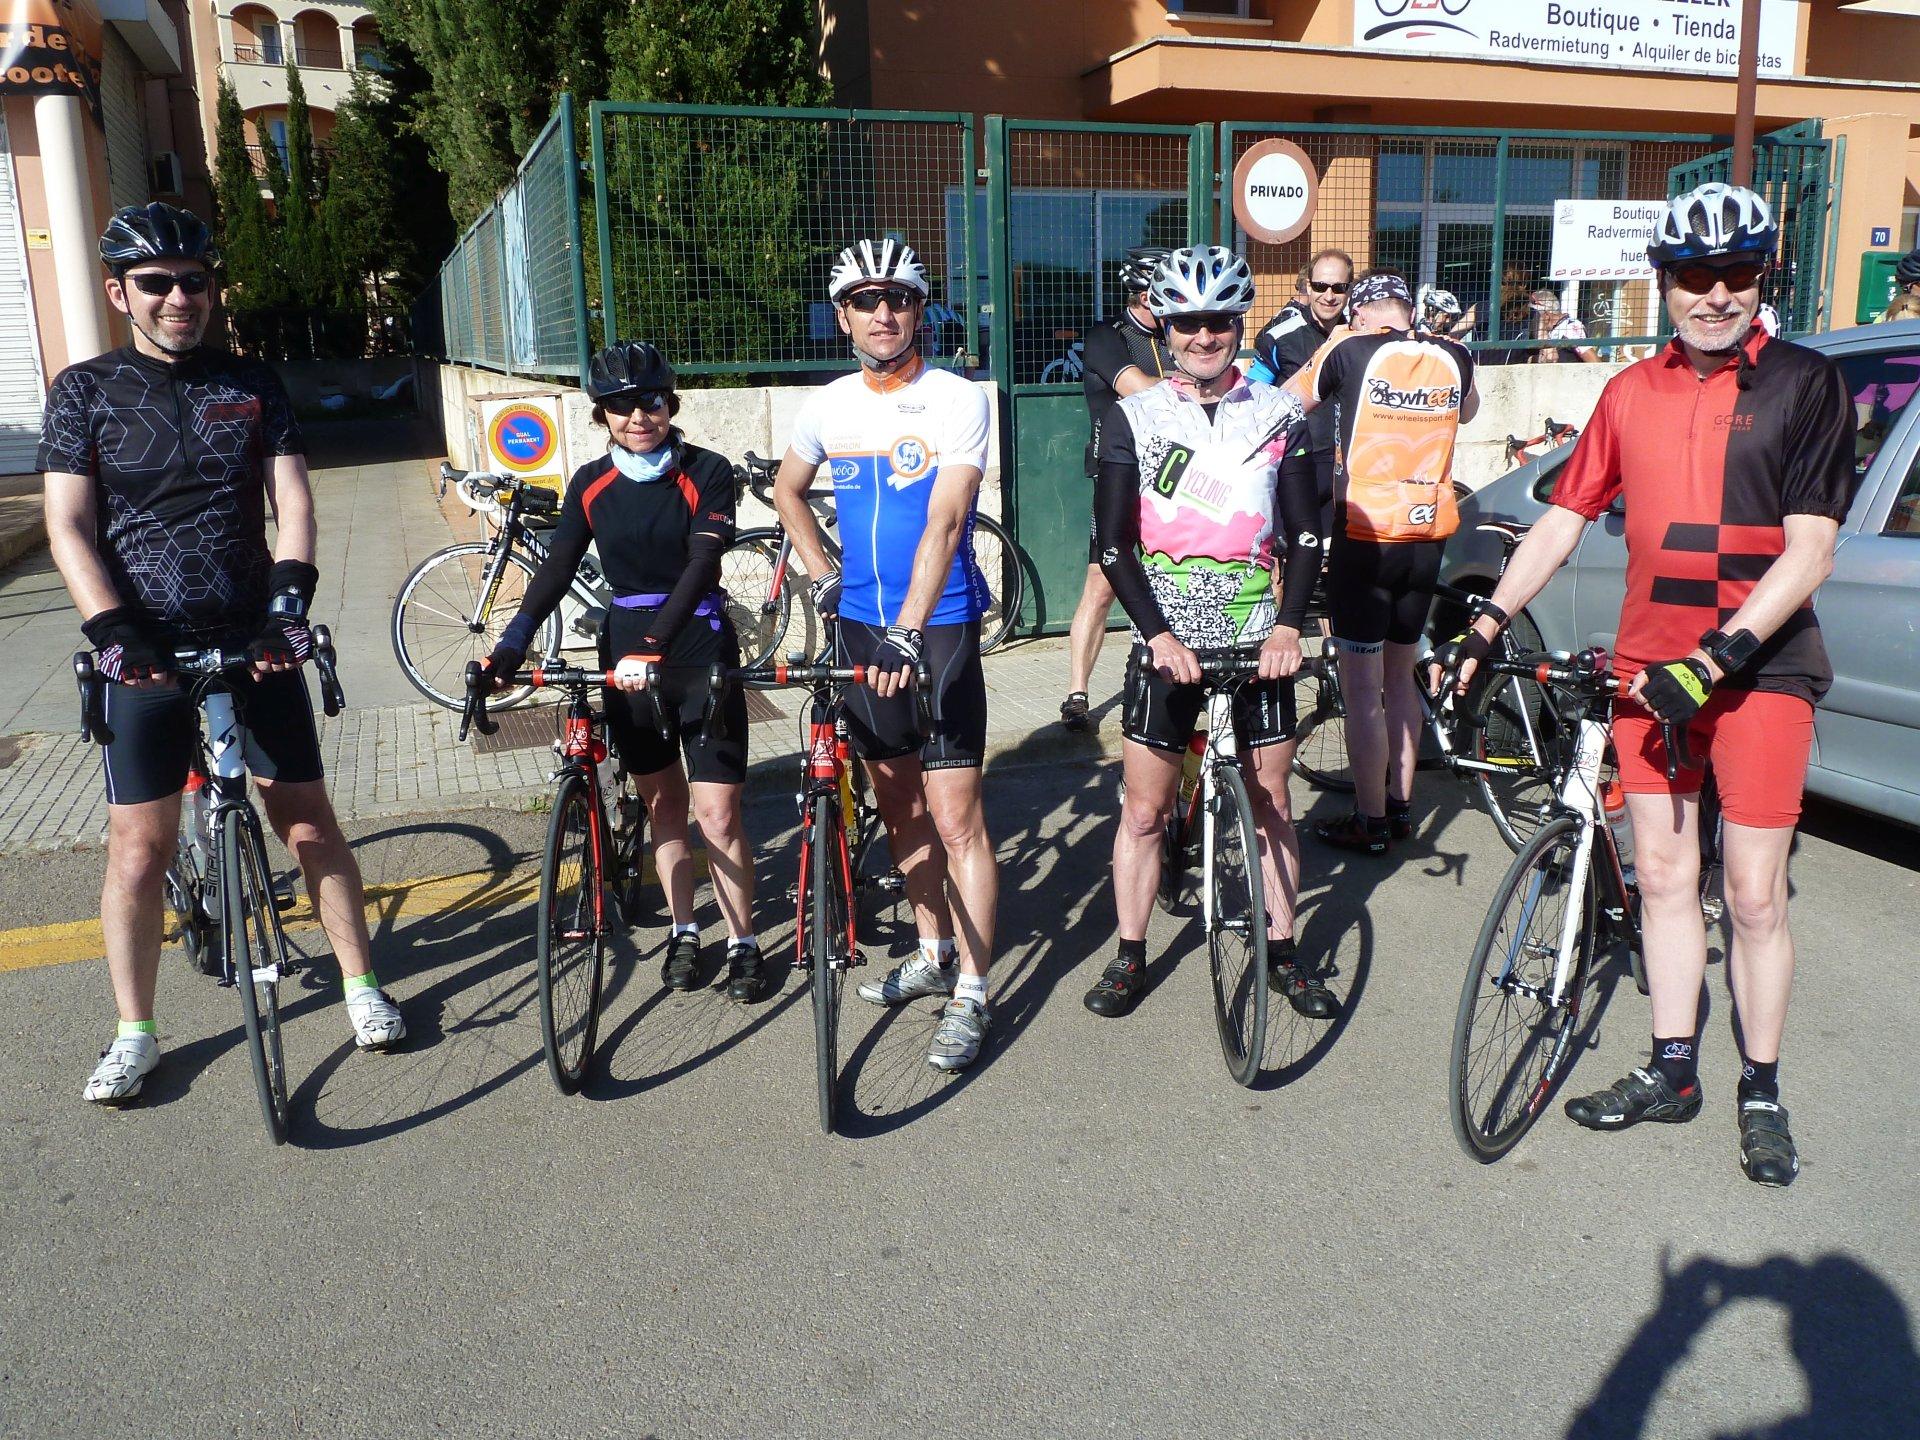 Tour-Start; von links: Wolfgang, Brigitte, Jürgen, Ralf, Hartmut